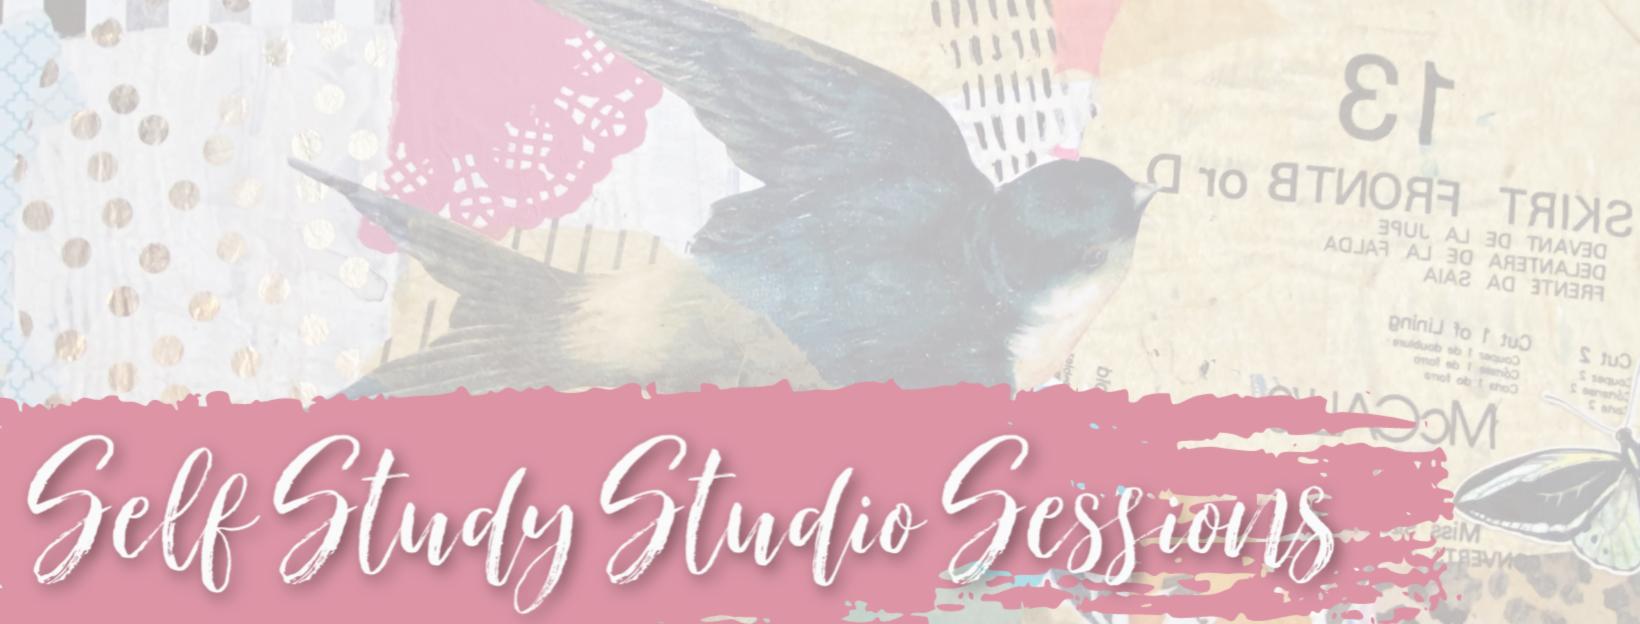 Self Study Studio Sessions